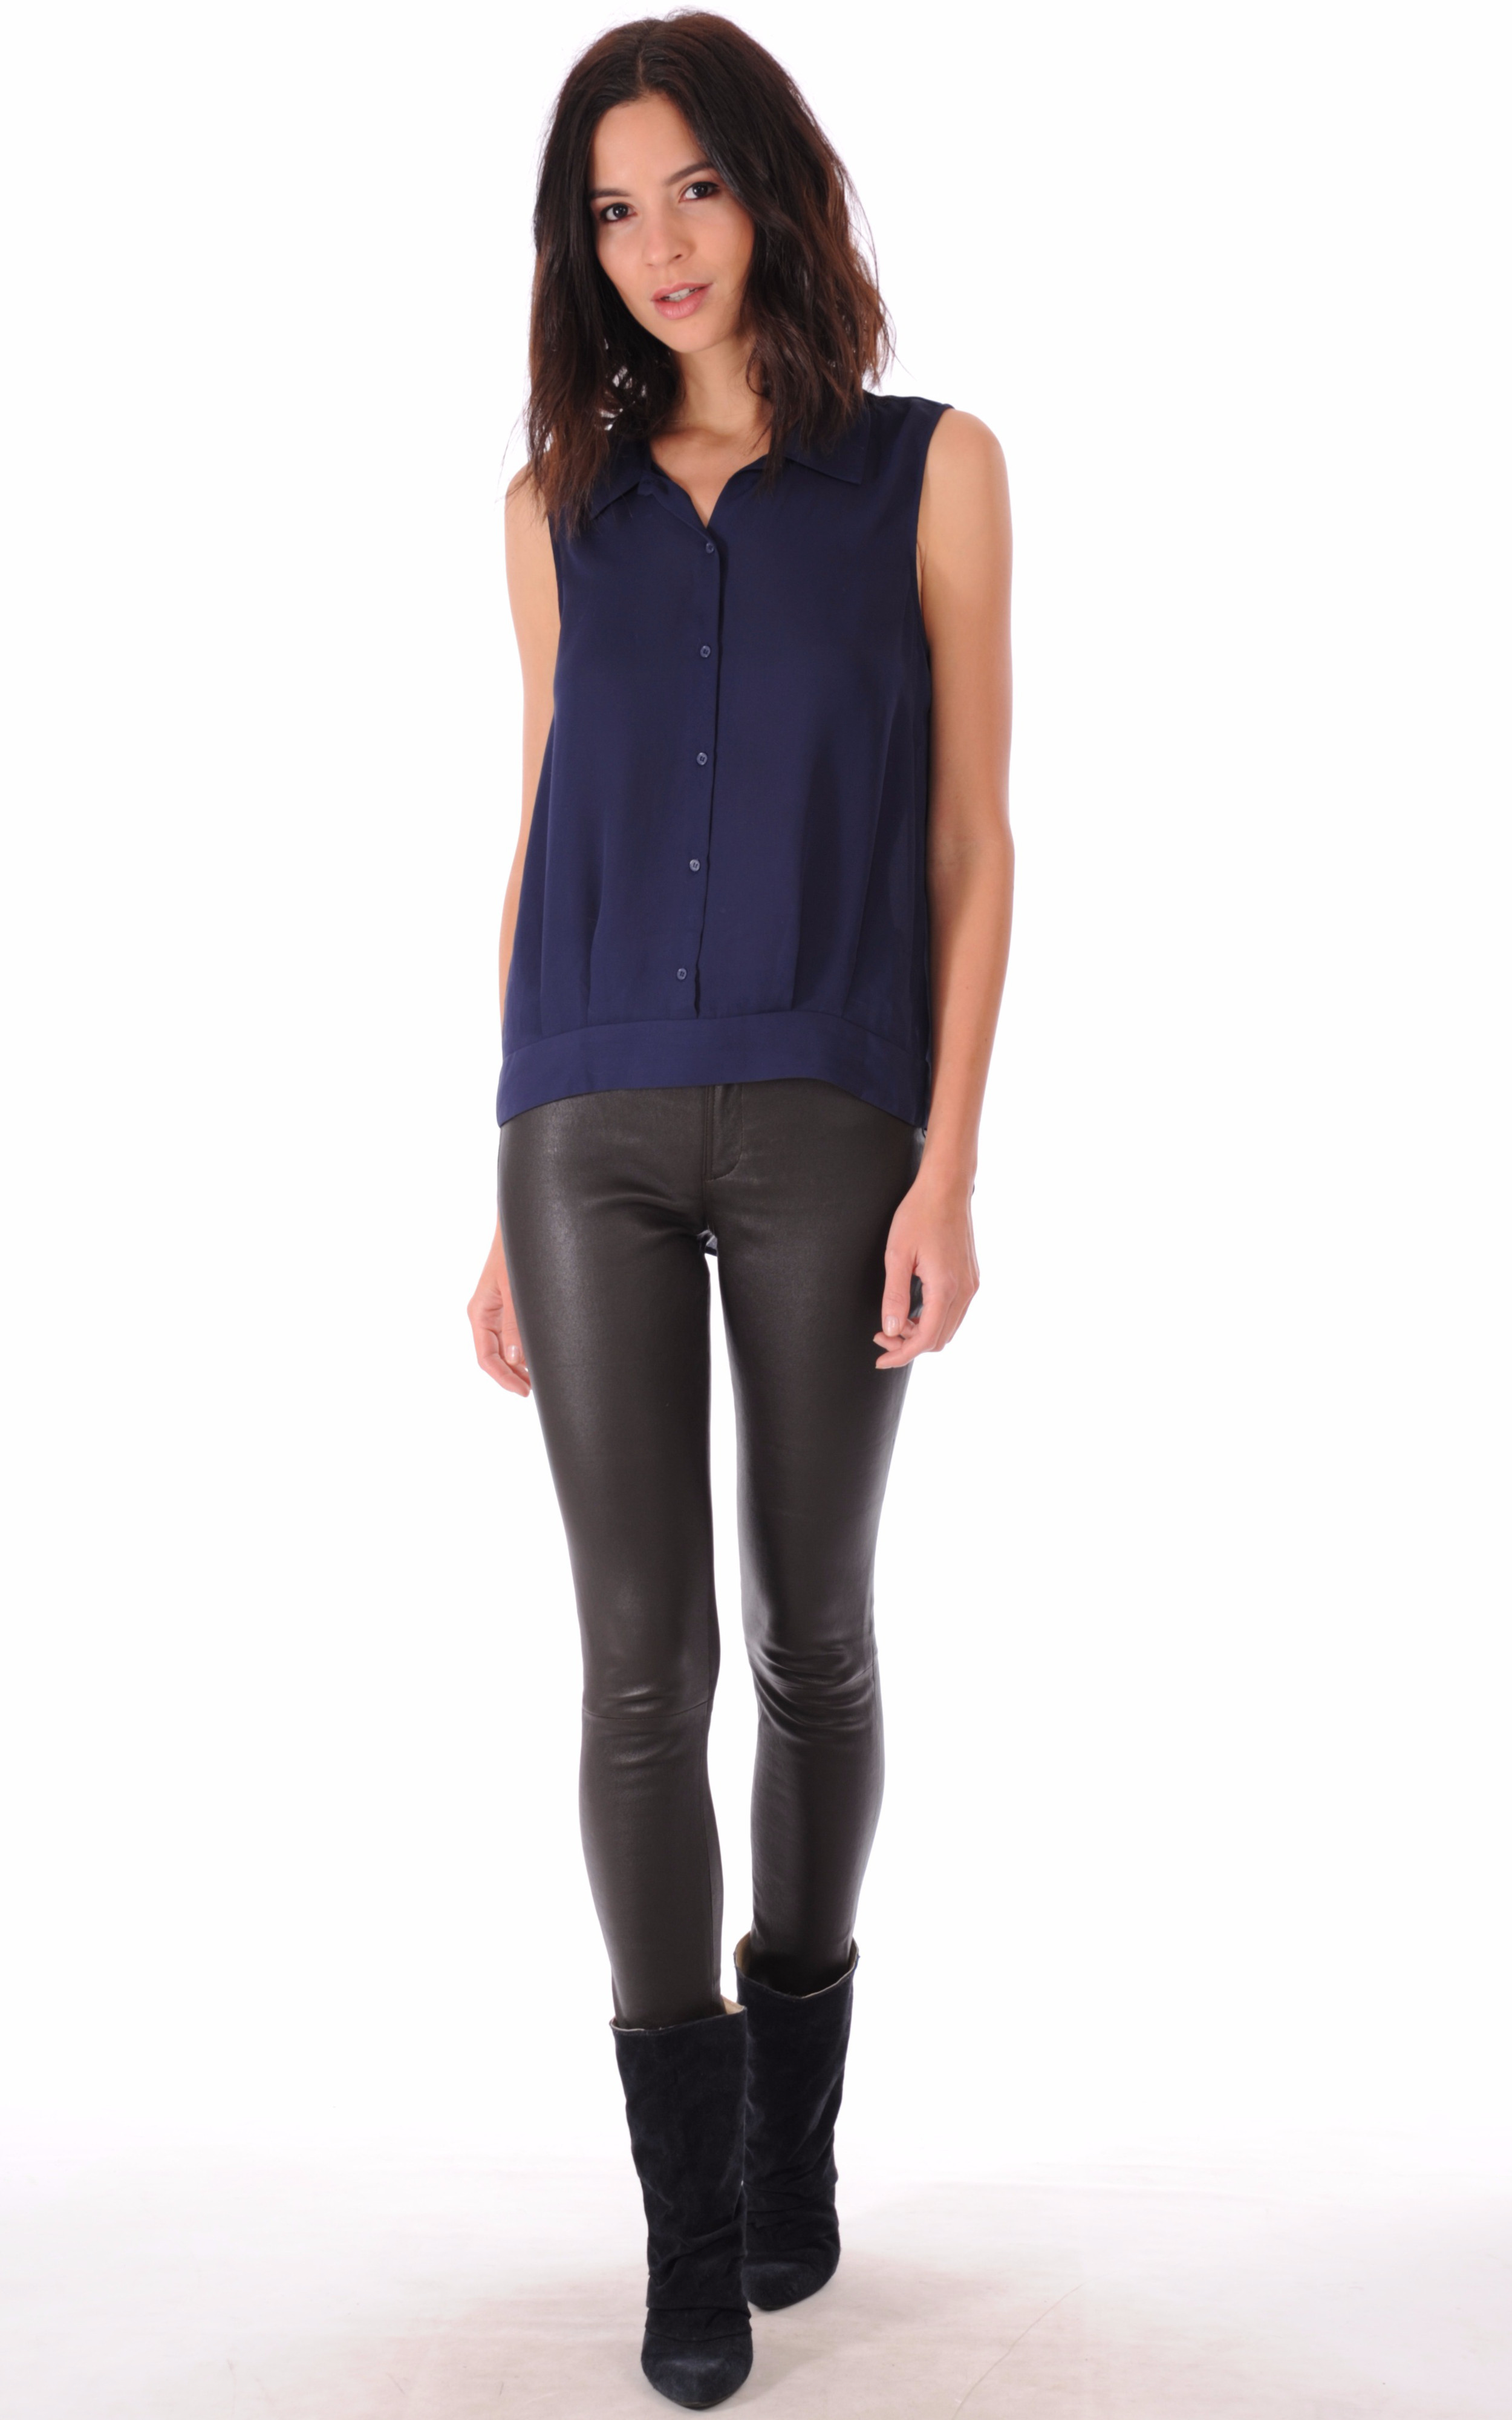 pantalon cuir slim marron la canadienne la canadienne pantalon short cuir marron. Black Bedroom Furniture Sets. Home Design Ideas